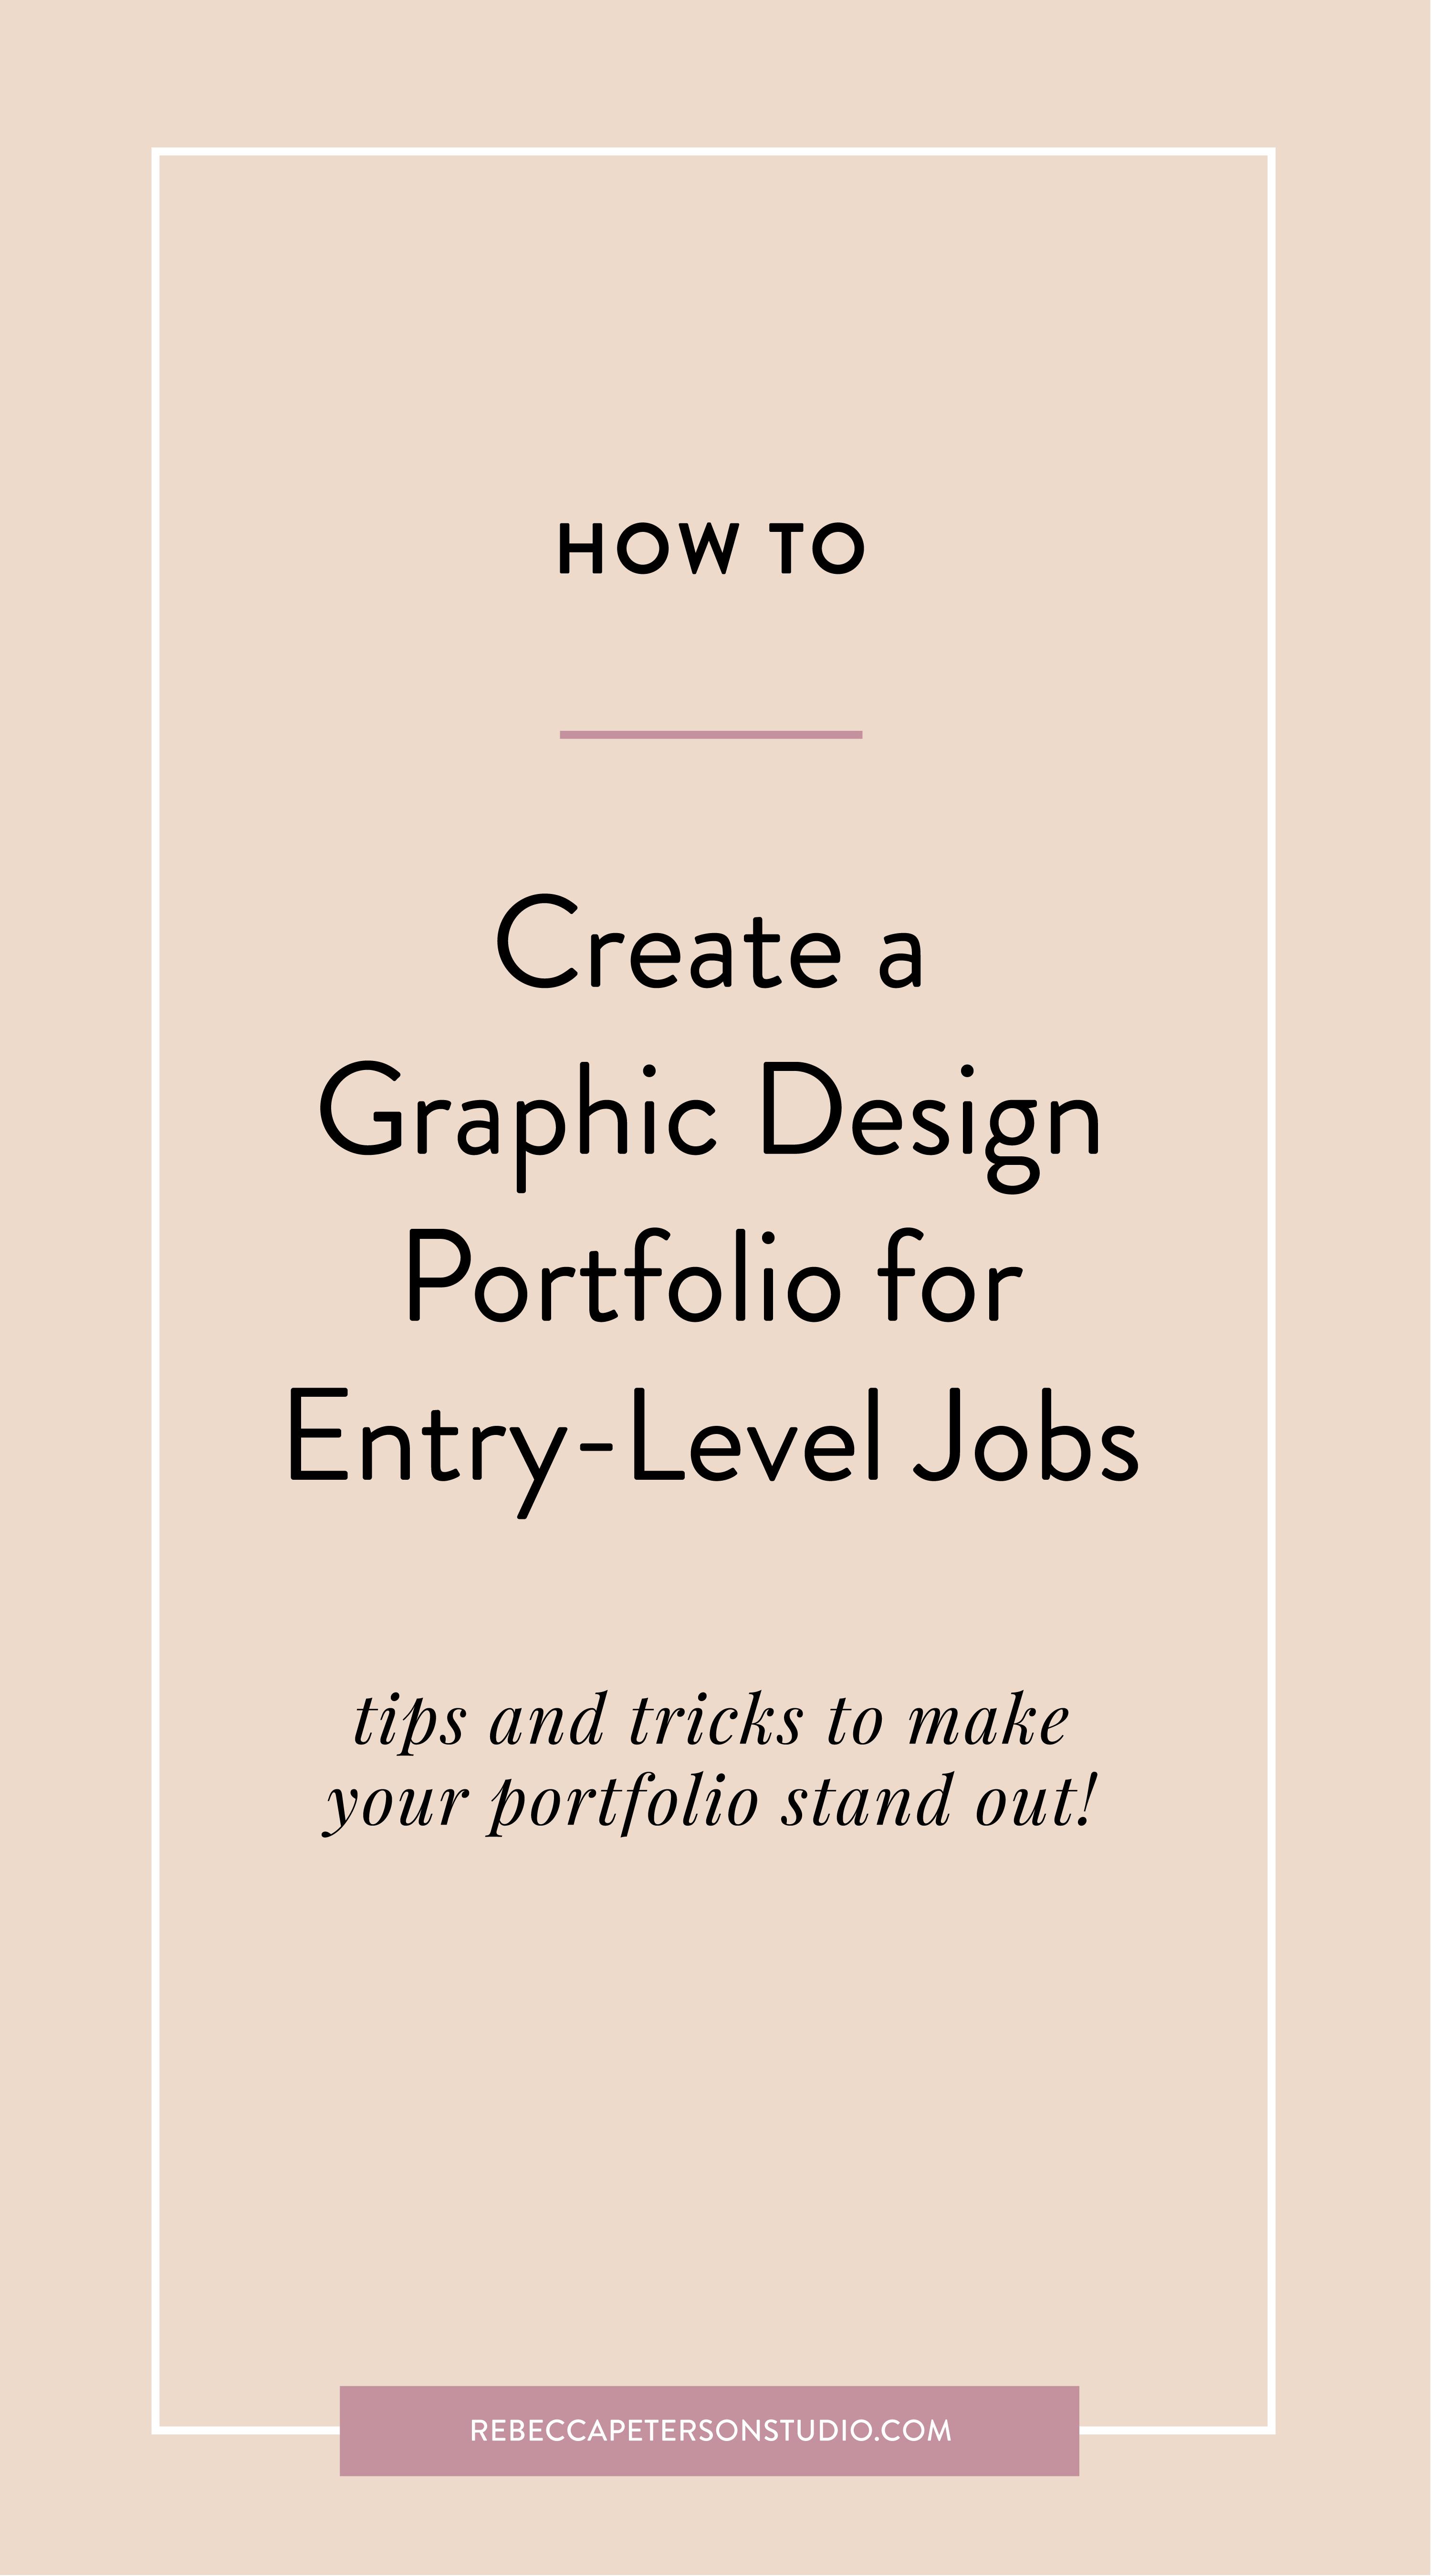 How To Create A Graphic Design Portfolio For Entry Level Jobs Rebecca Peterson Studio Graphic Design Portfolio Layout Portfolio Design Graphic Design Business